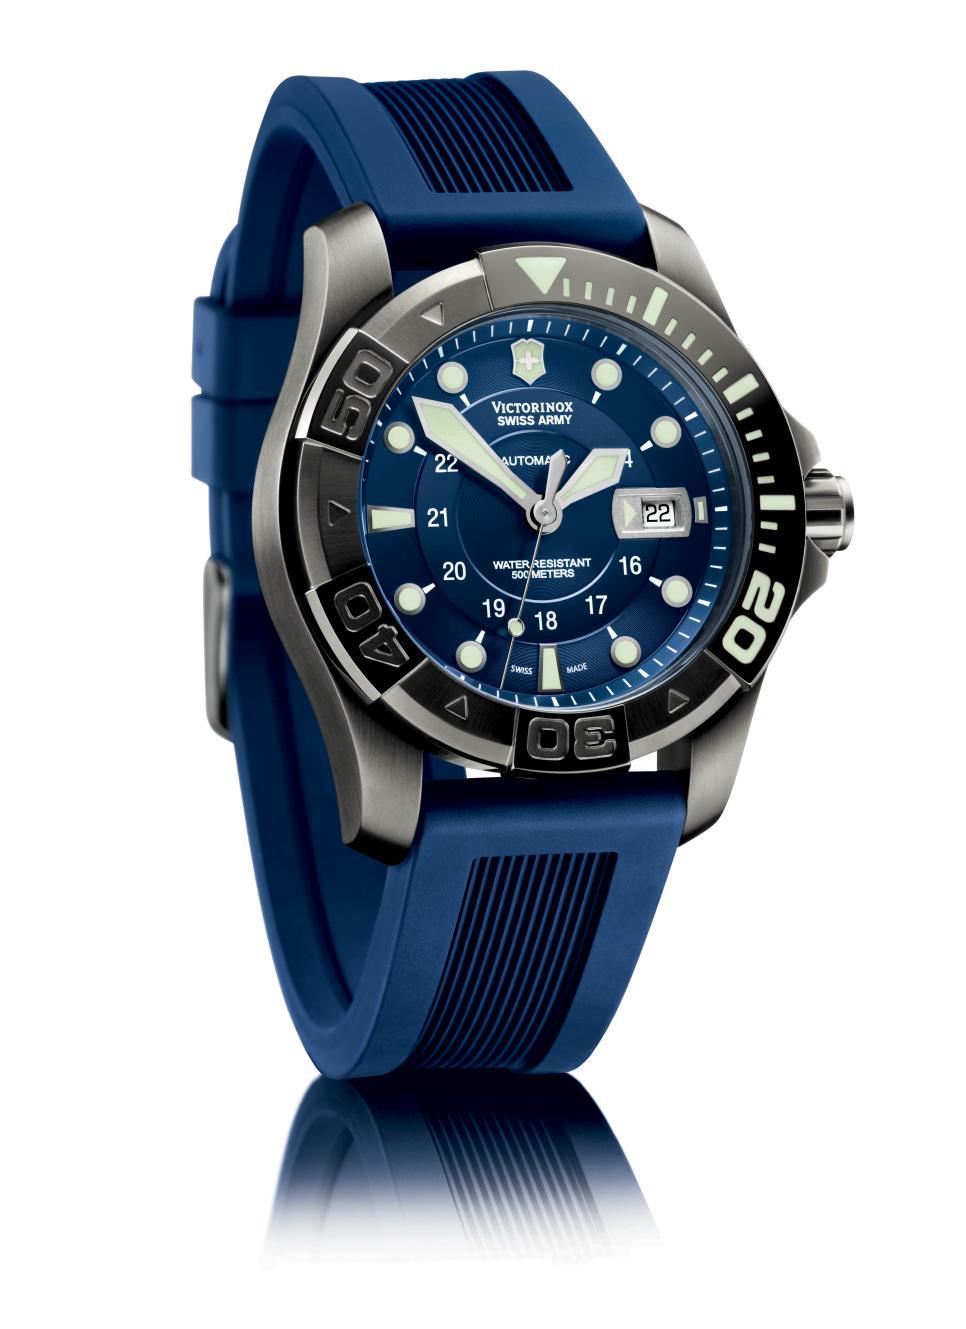 Victorinox Dive Master 500 PVD Blue Ice